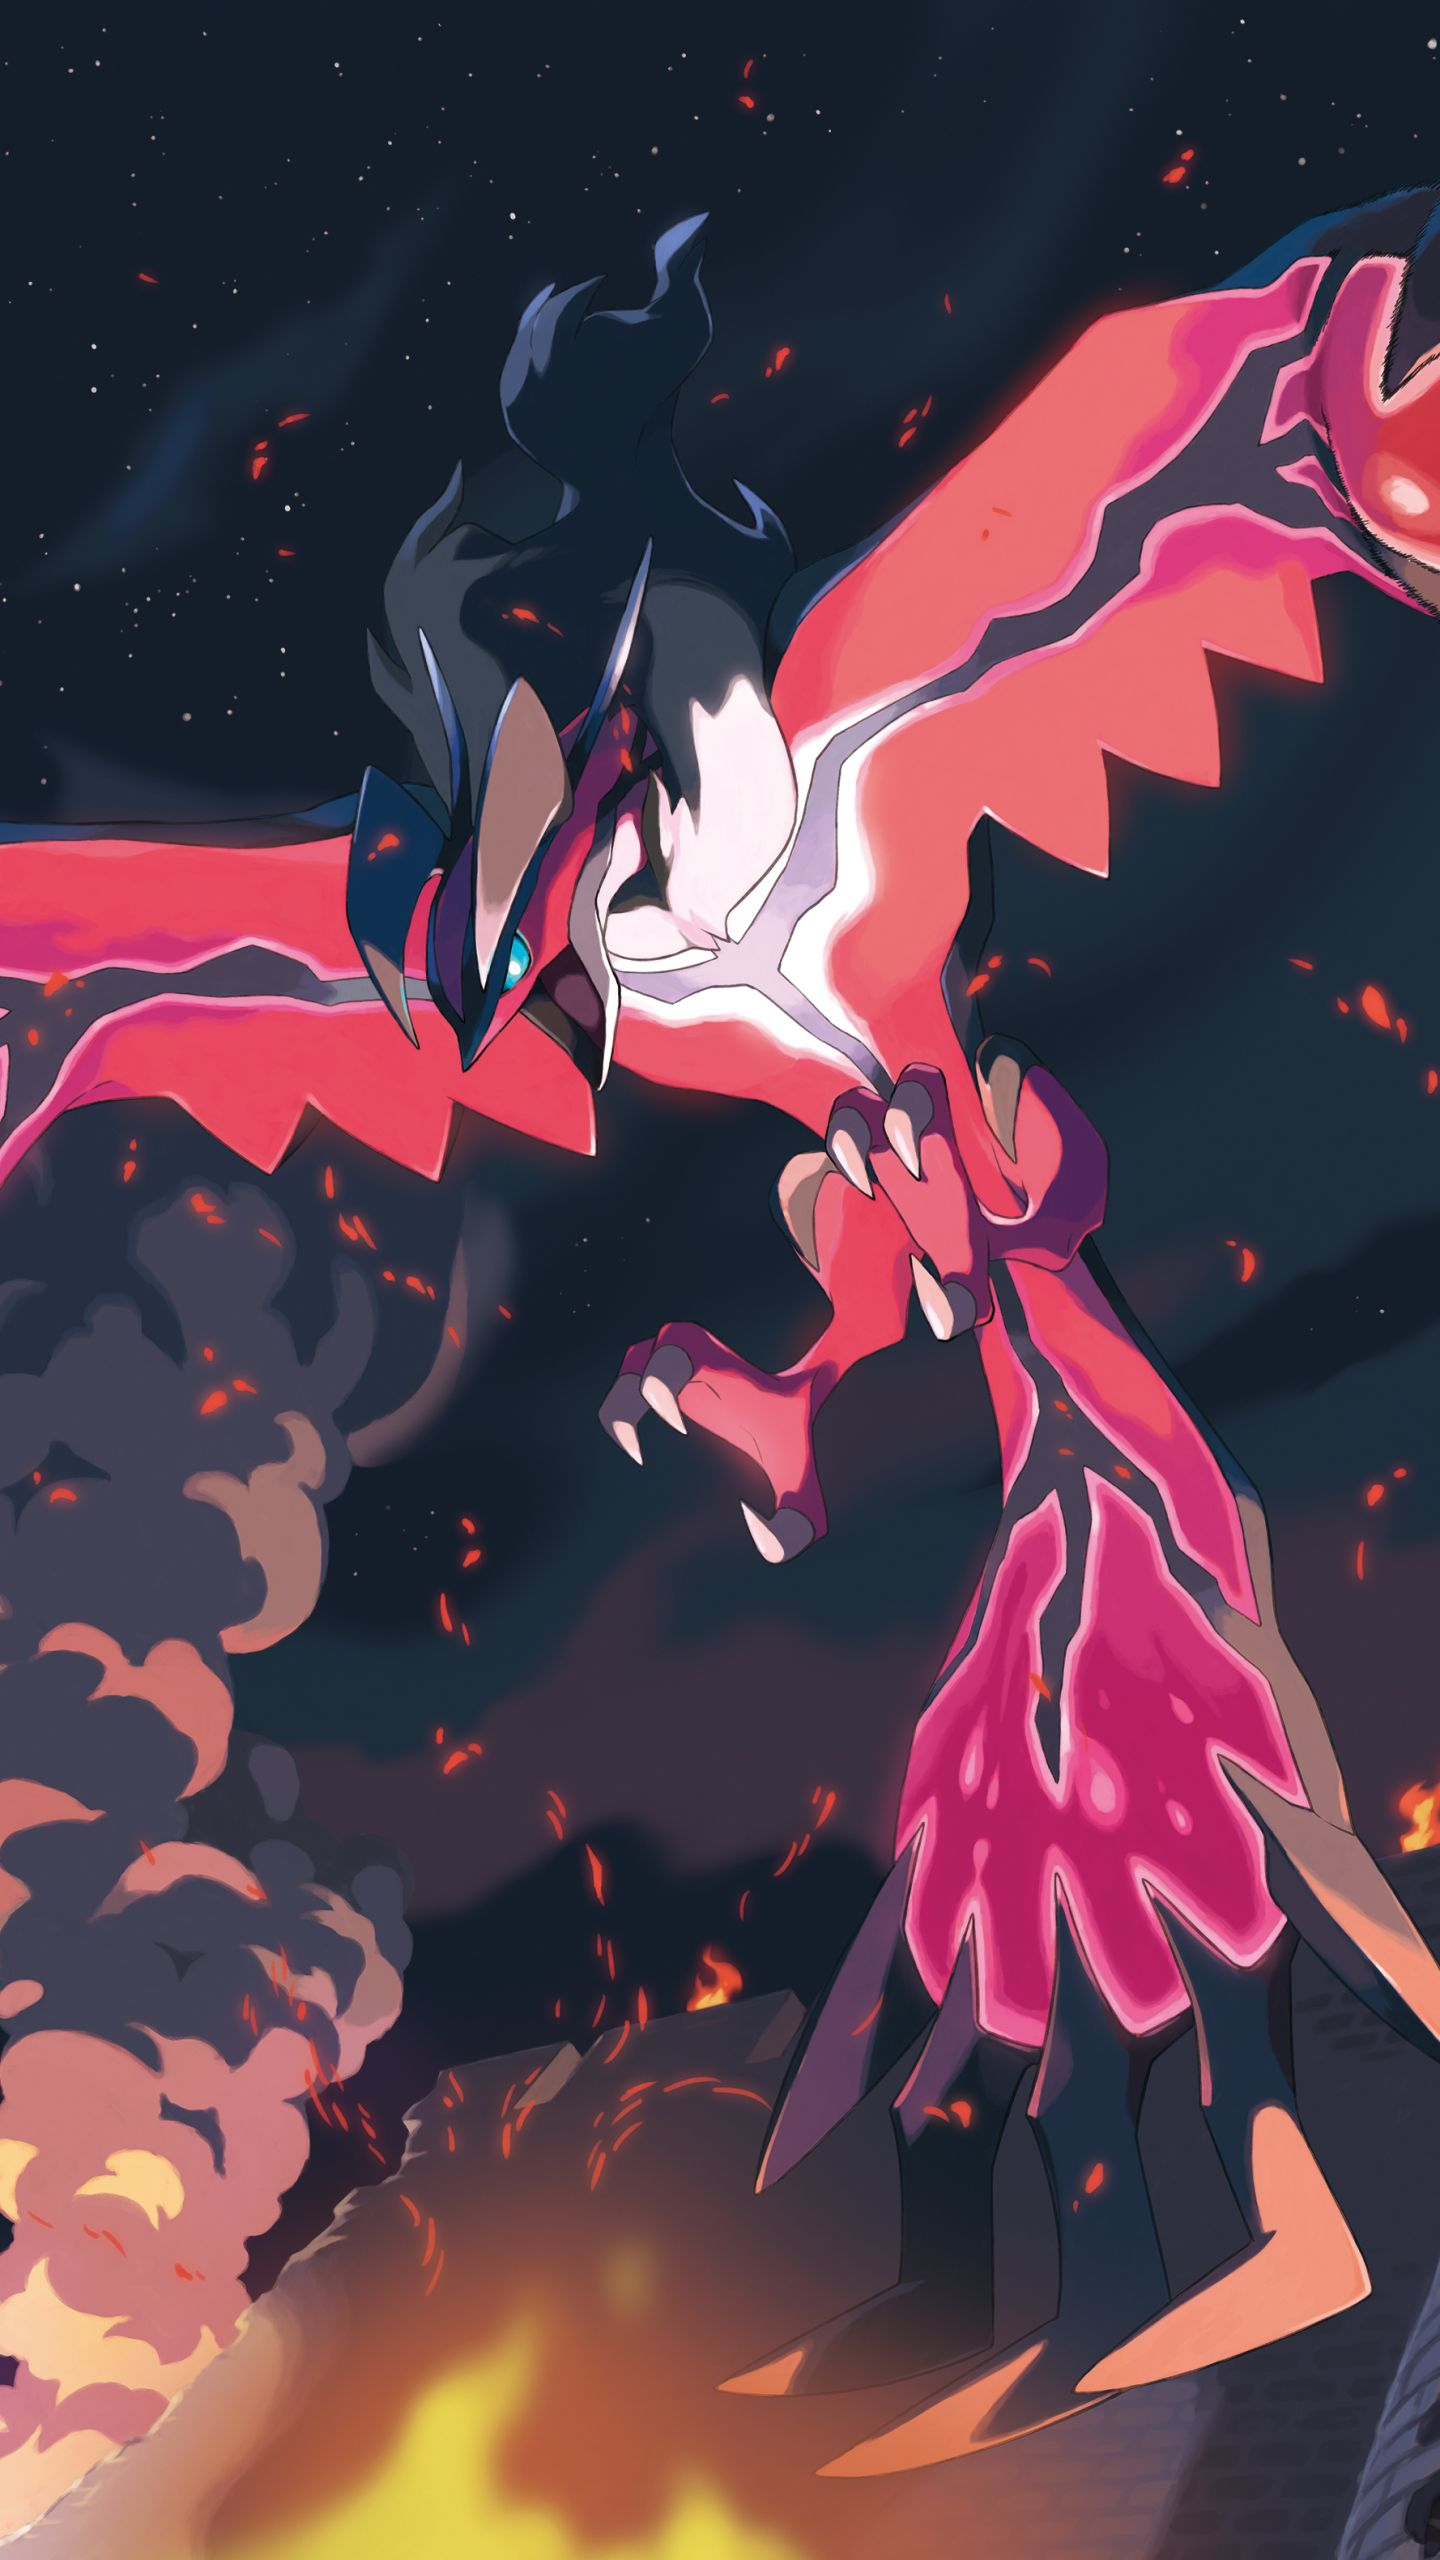 Video Game Pokemon Pokémon Yveltal Mobile Wallpaper   Pokemons   Pokémon, Mythical pokemon ...